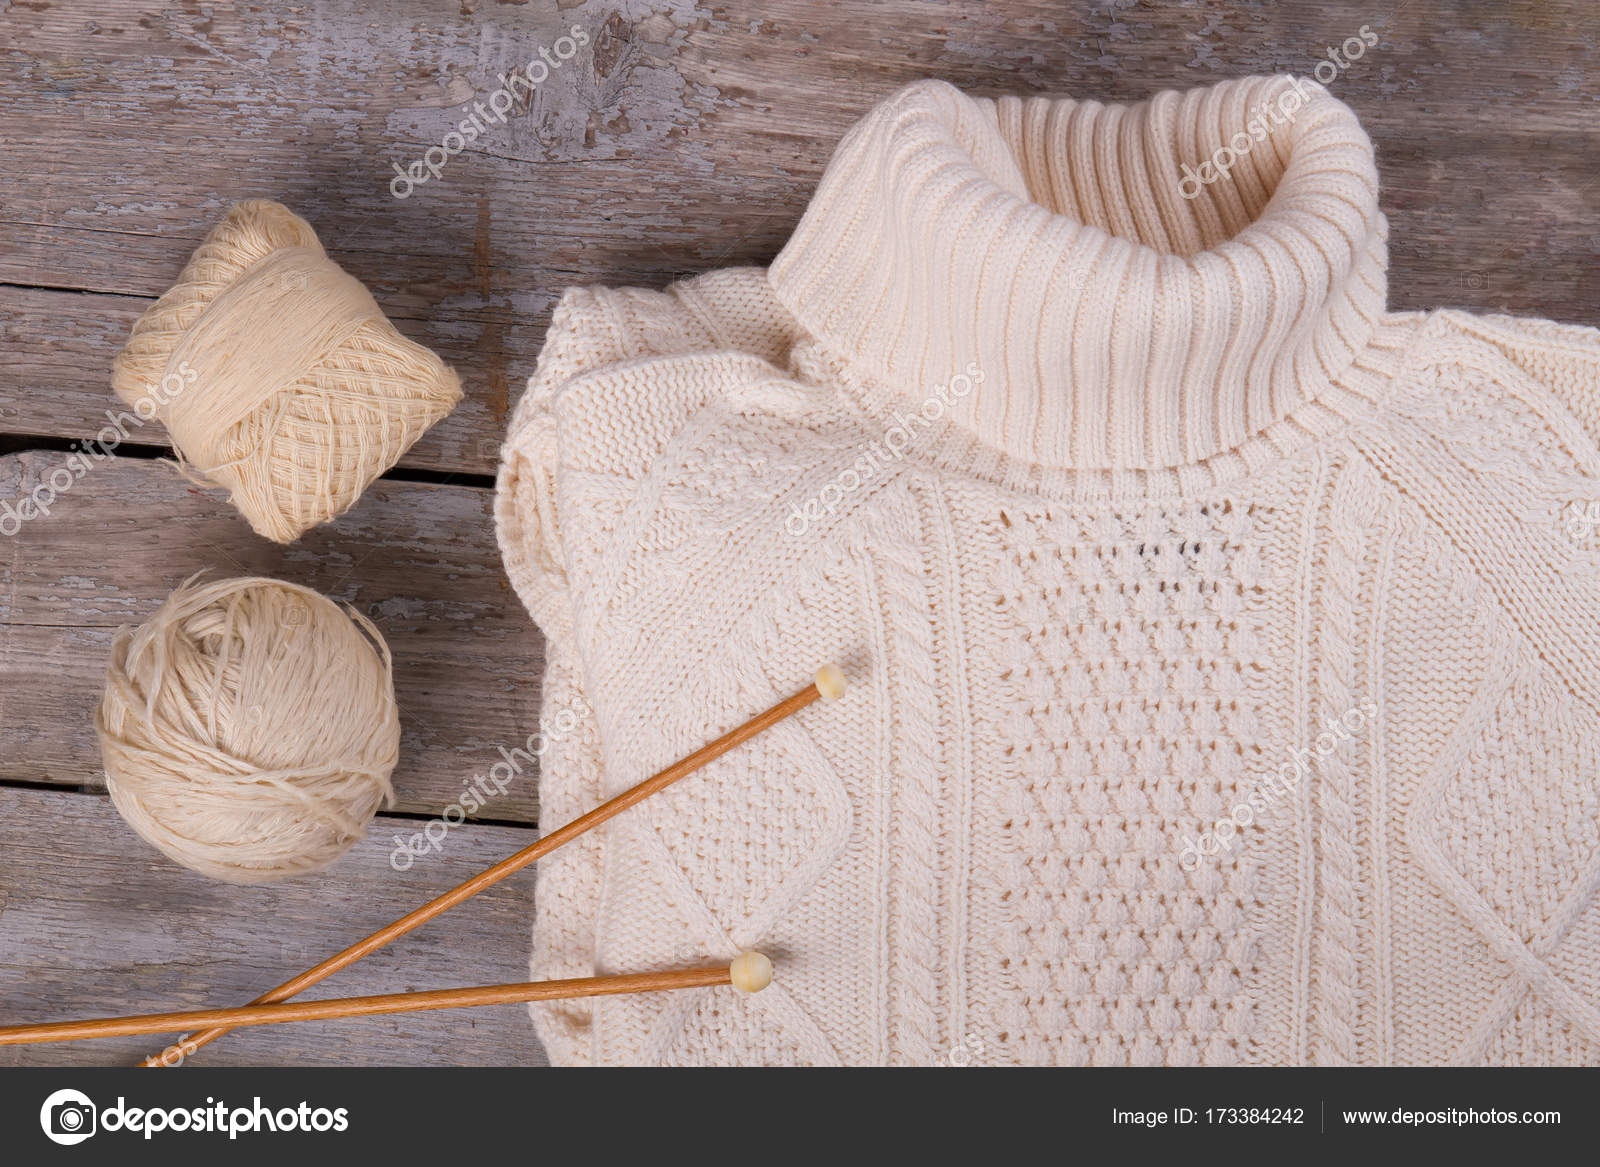 d902357c6b54 Λευκό ΠΟΥΛΟΒΕΡ με ΖΙΒΑΓΚΟ σε ξύλινο υπόβαθρο. Βελόνες πλεξίματος και μικρές  κούκλες από νήματα μάλλινα. Χειροποίητα ρούχα — Εικόνα από ...